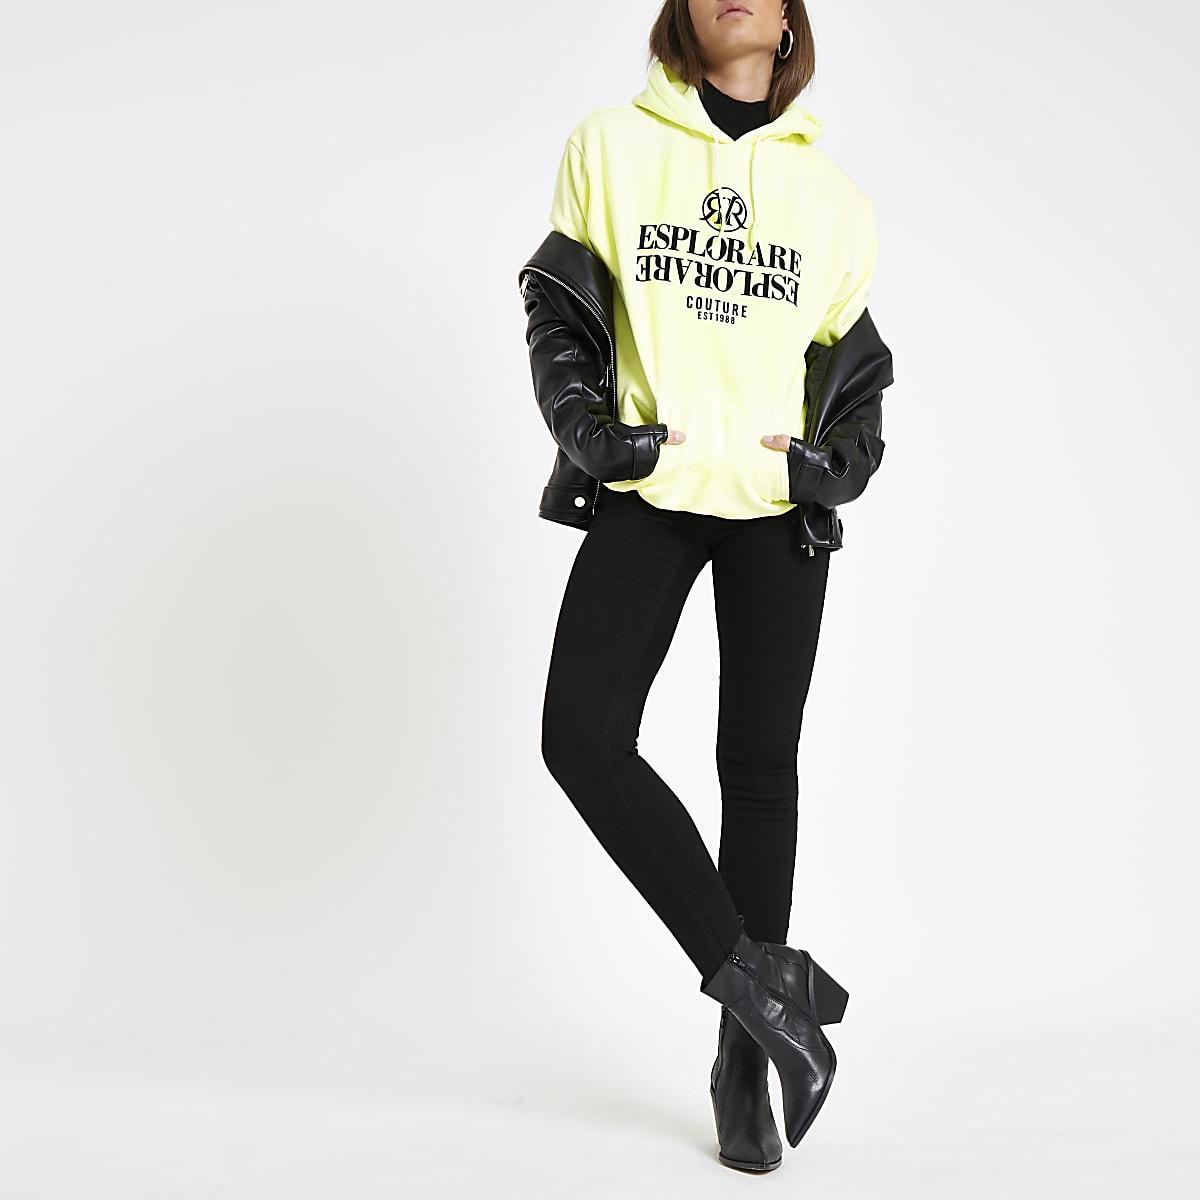 Fluro yellow 'Esplorare' flock print hoodie